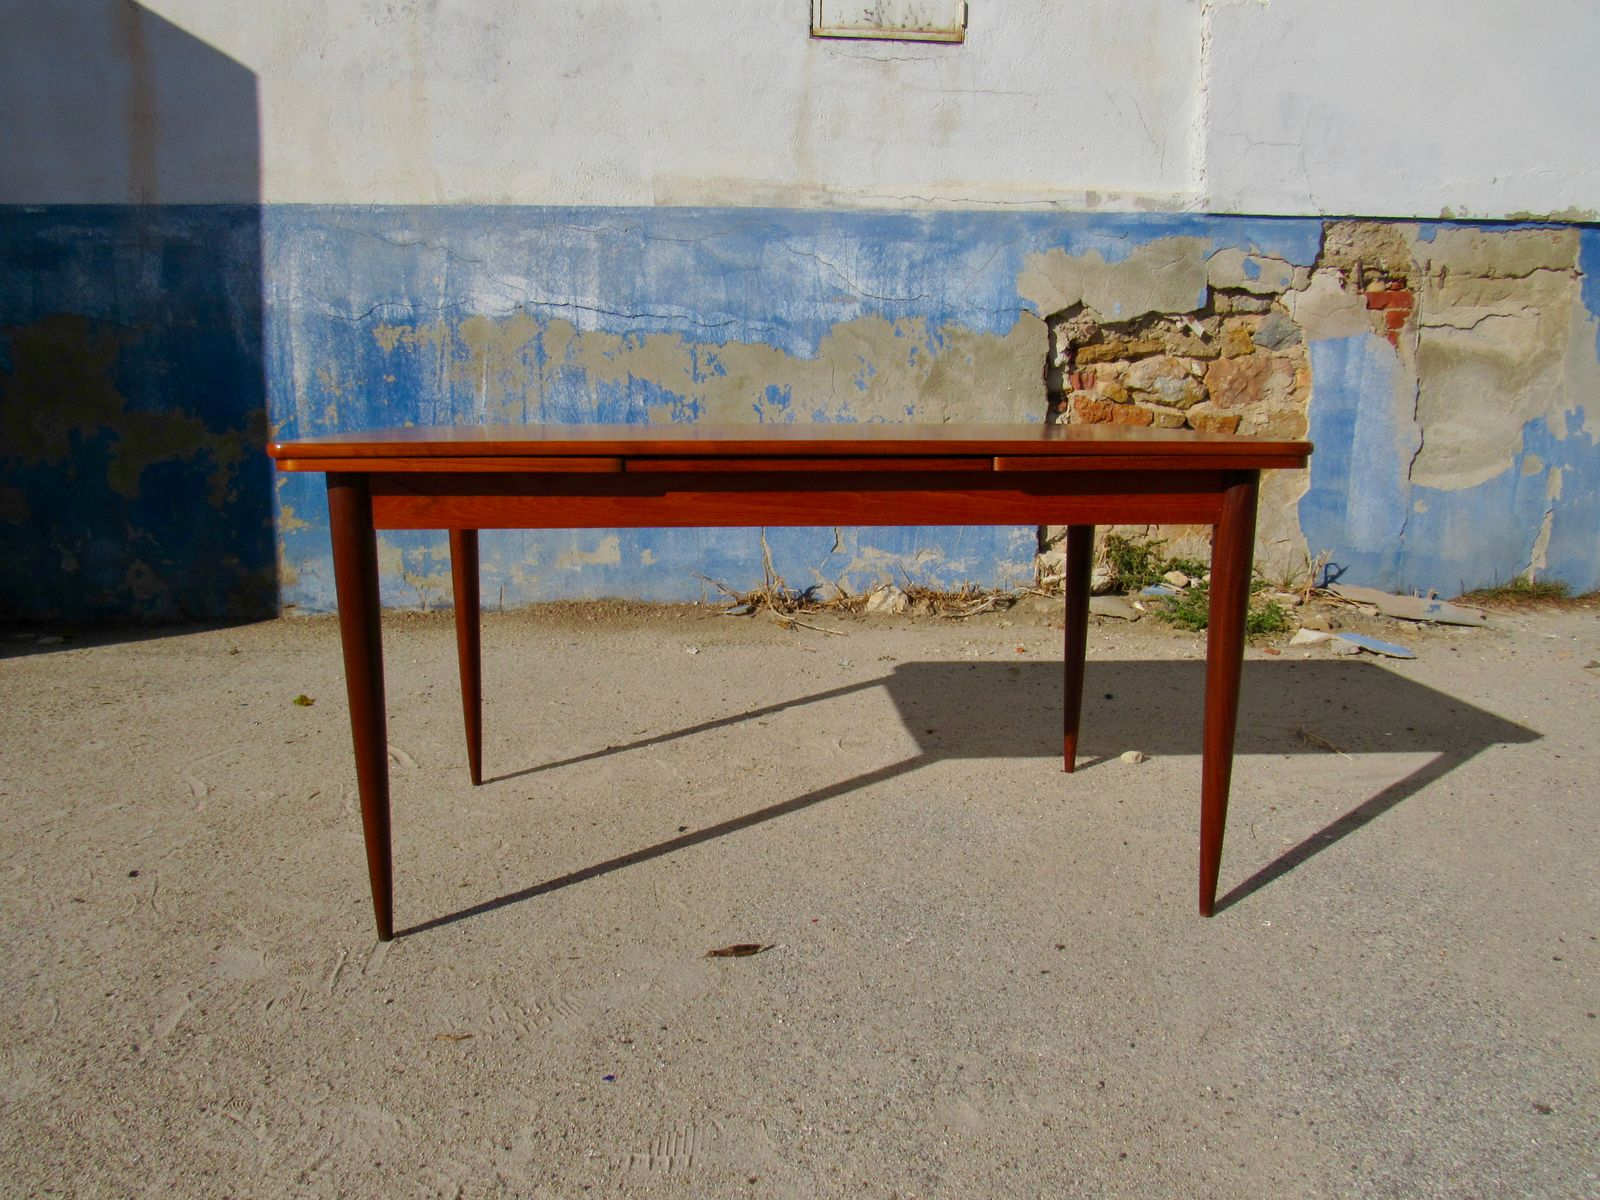 Table de salle manger mid century 1960s en vente sur pamono for Table salle a manger usage